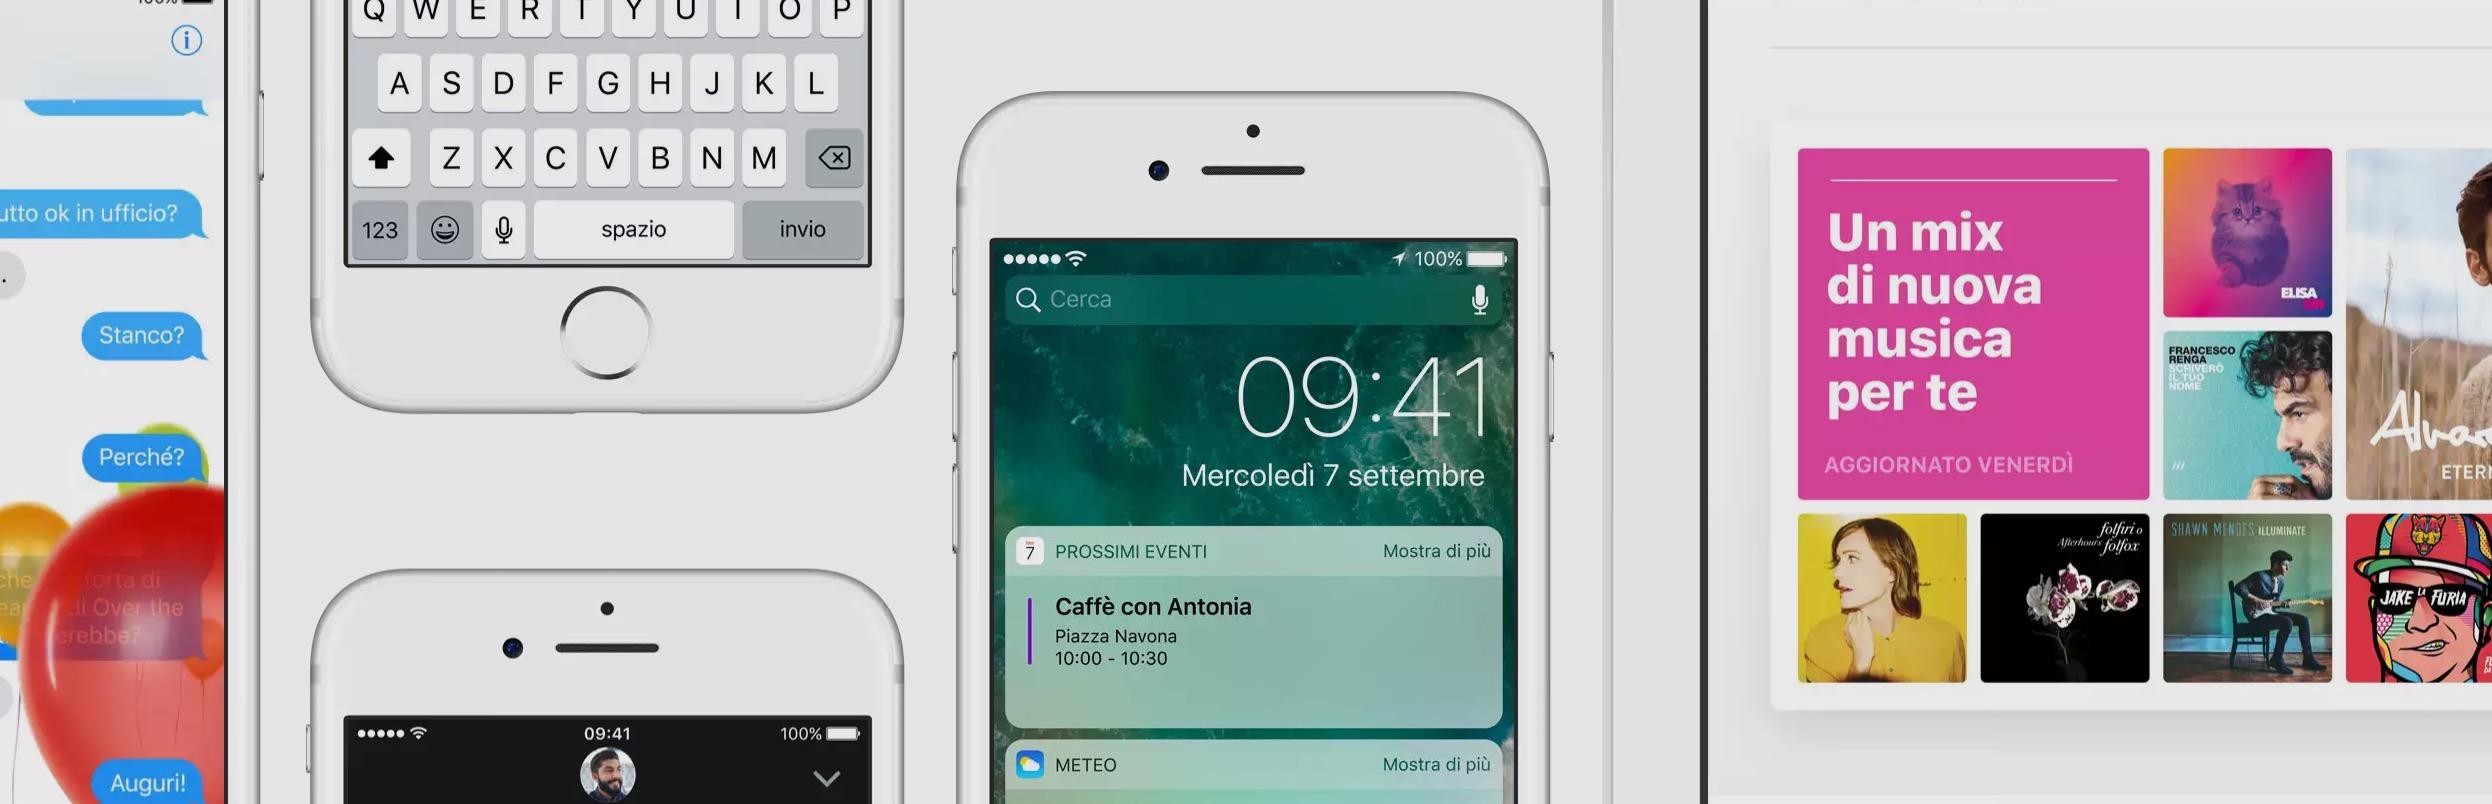 iOS 10 rilasciato